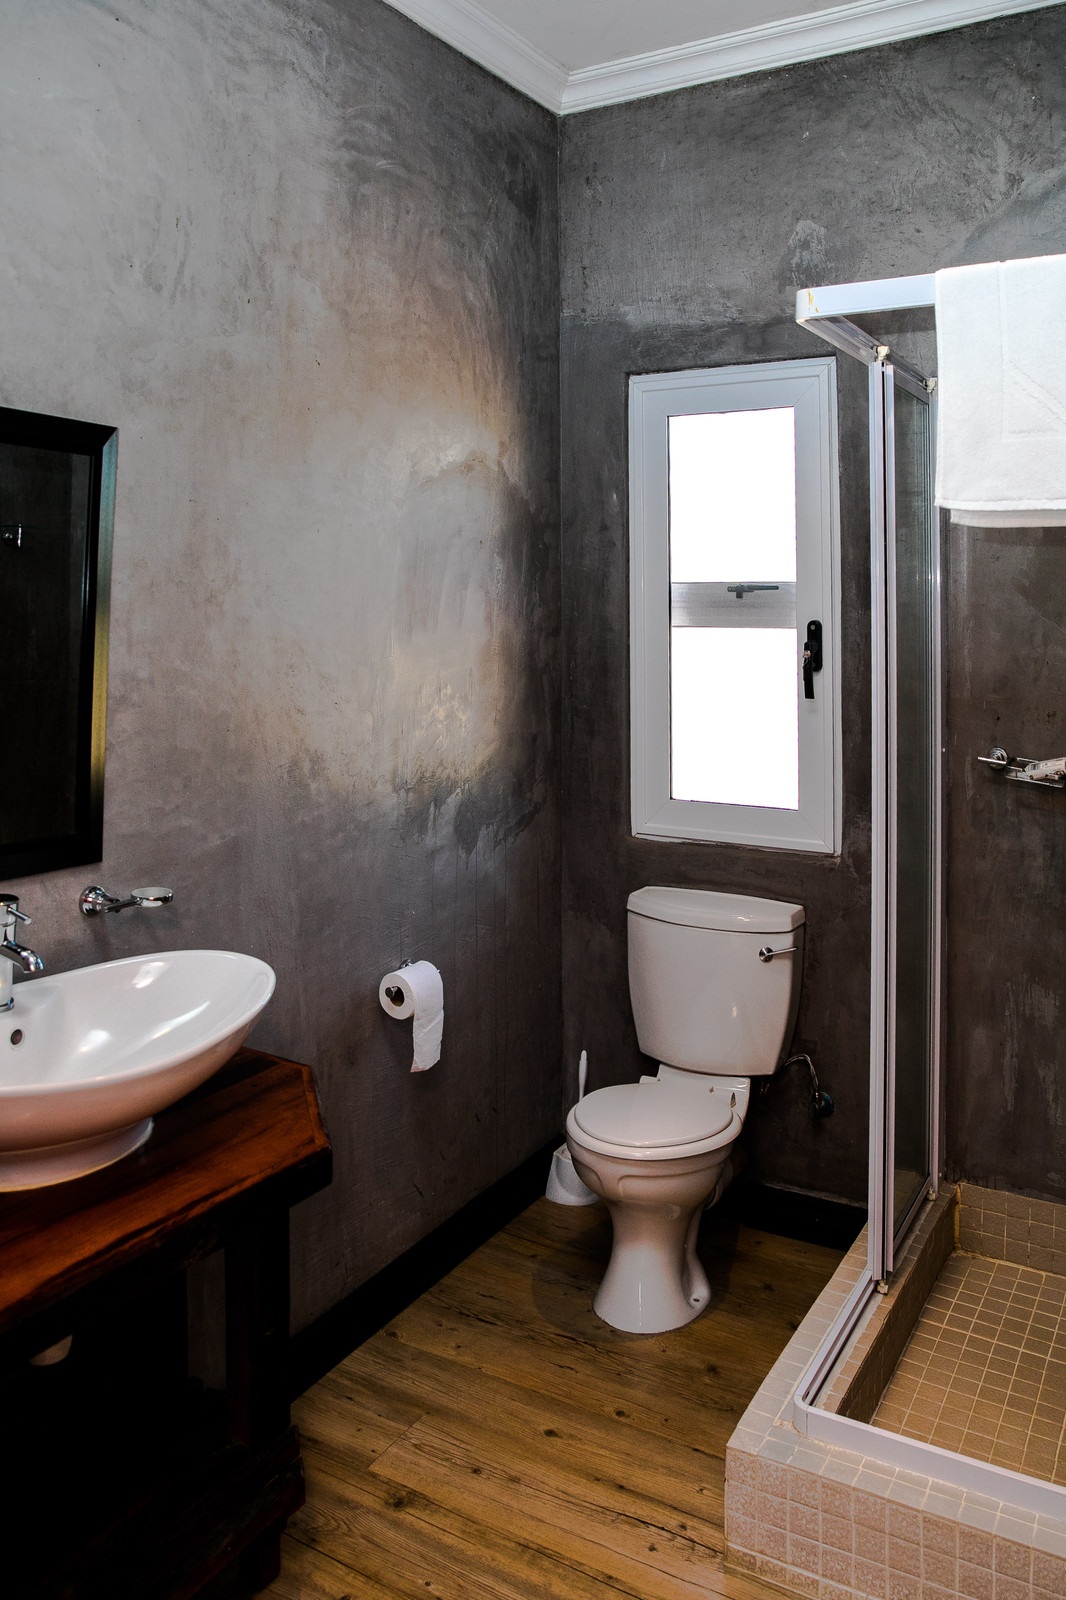 orchard cottage main en suite bathroom - En Suite Bathroom